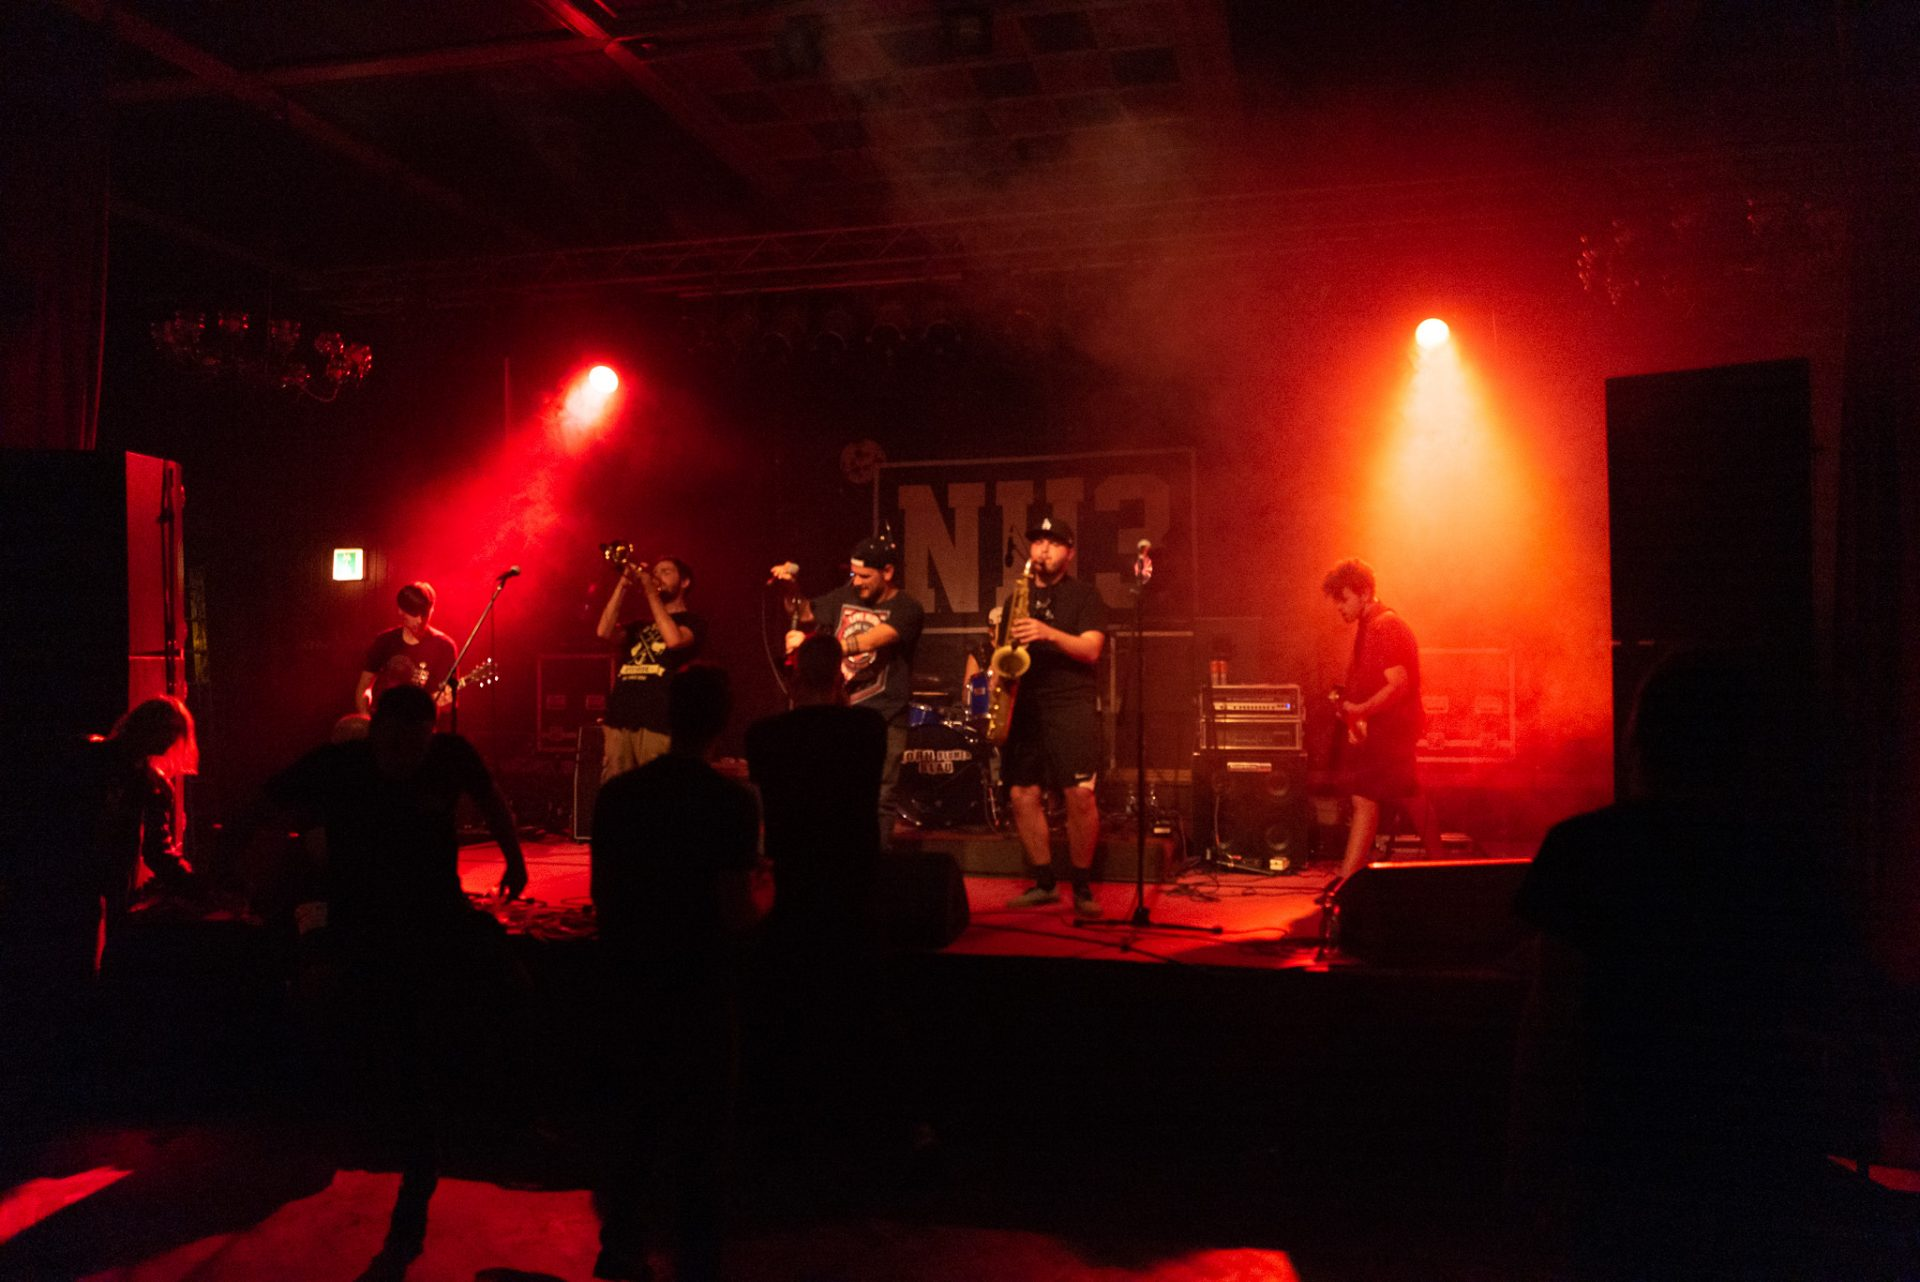 NH3 - Band